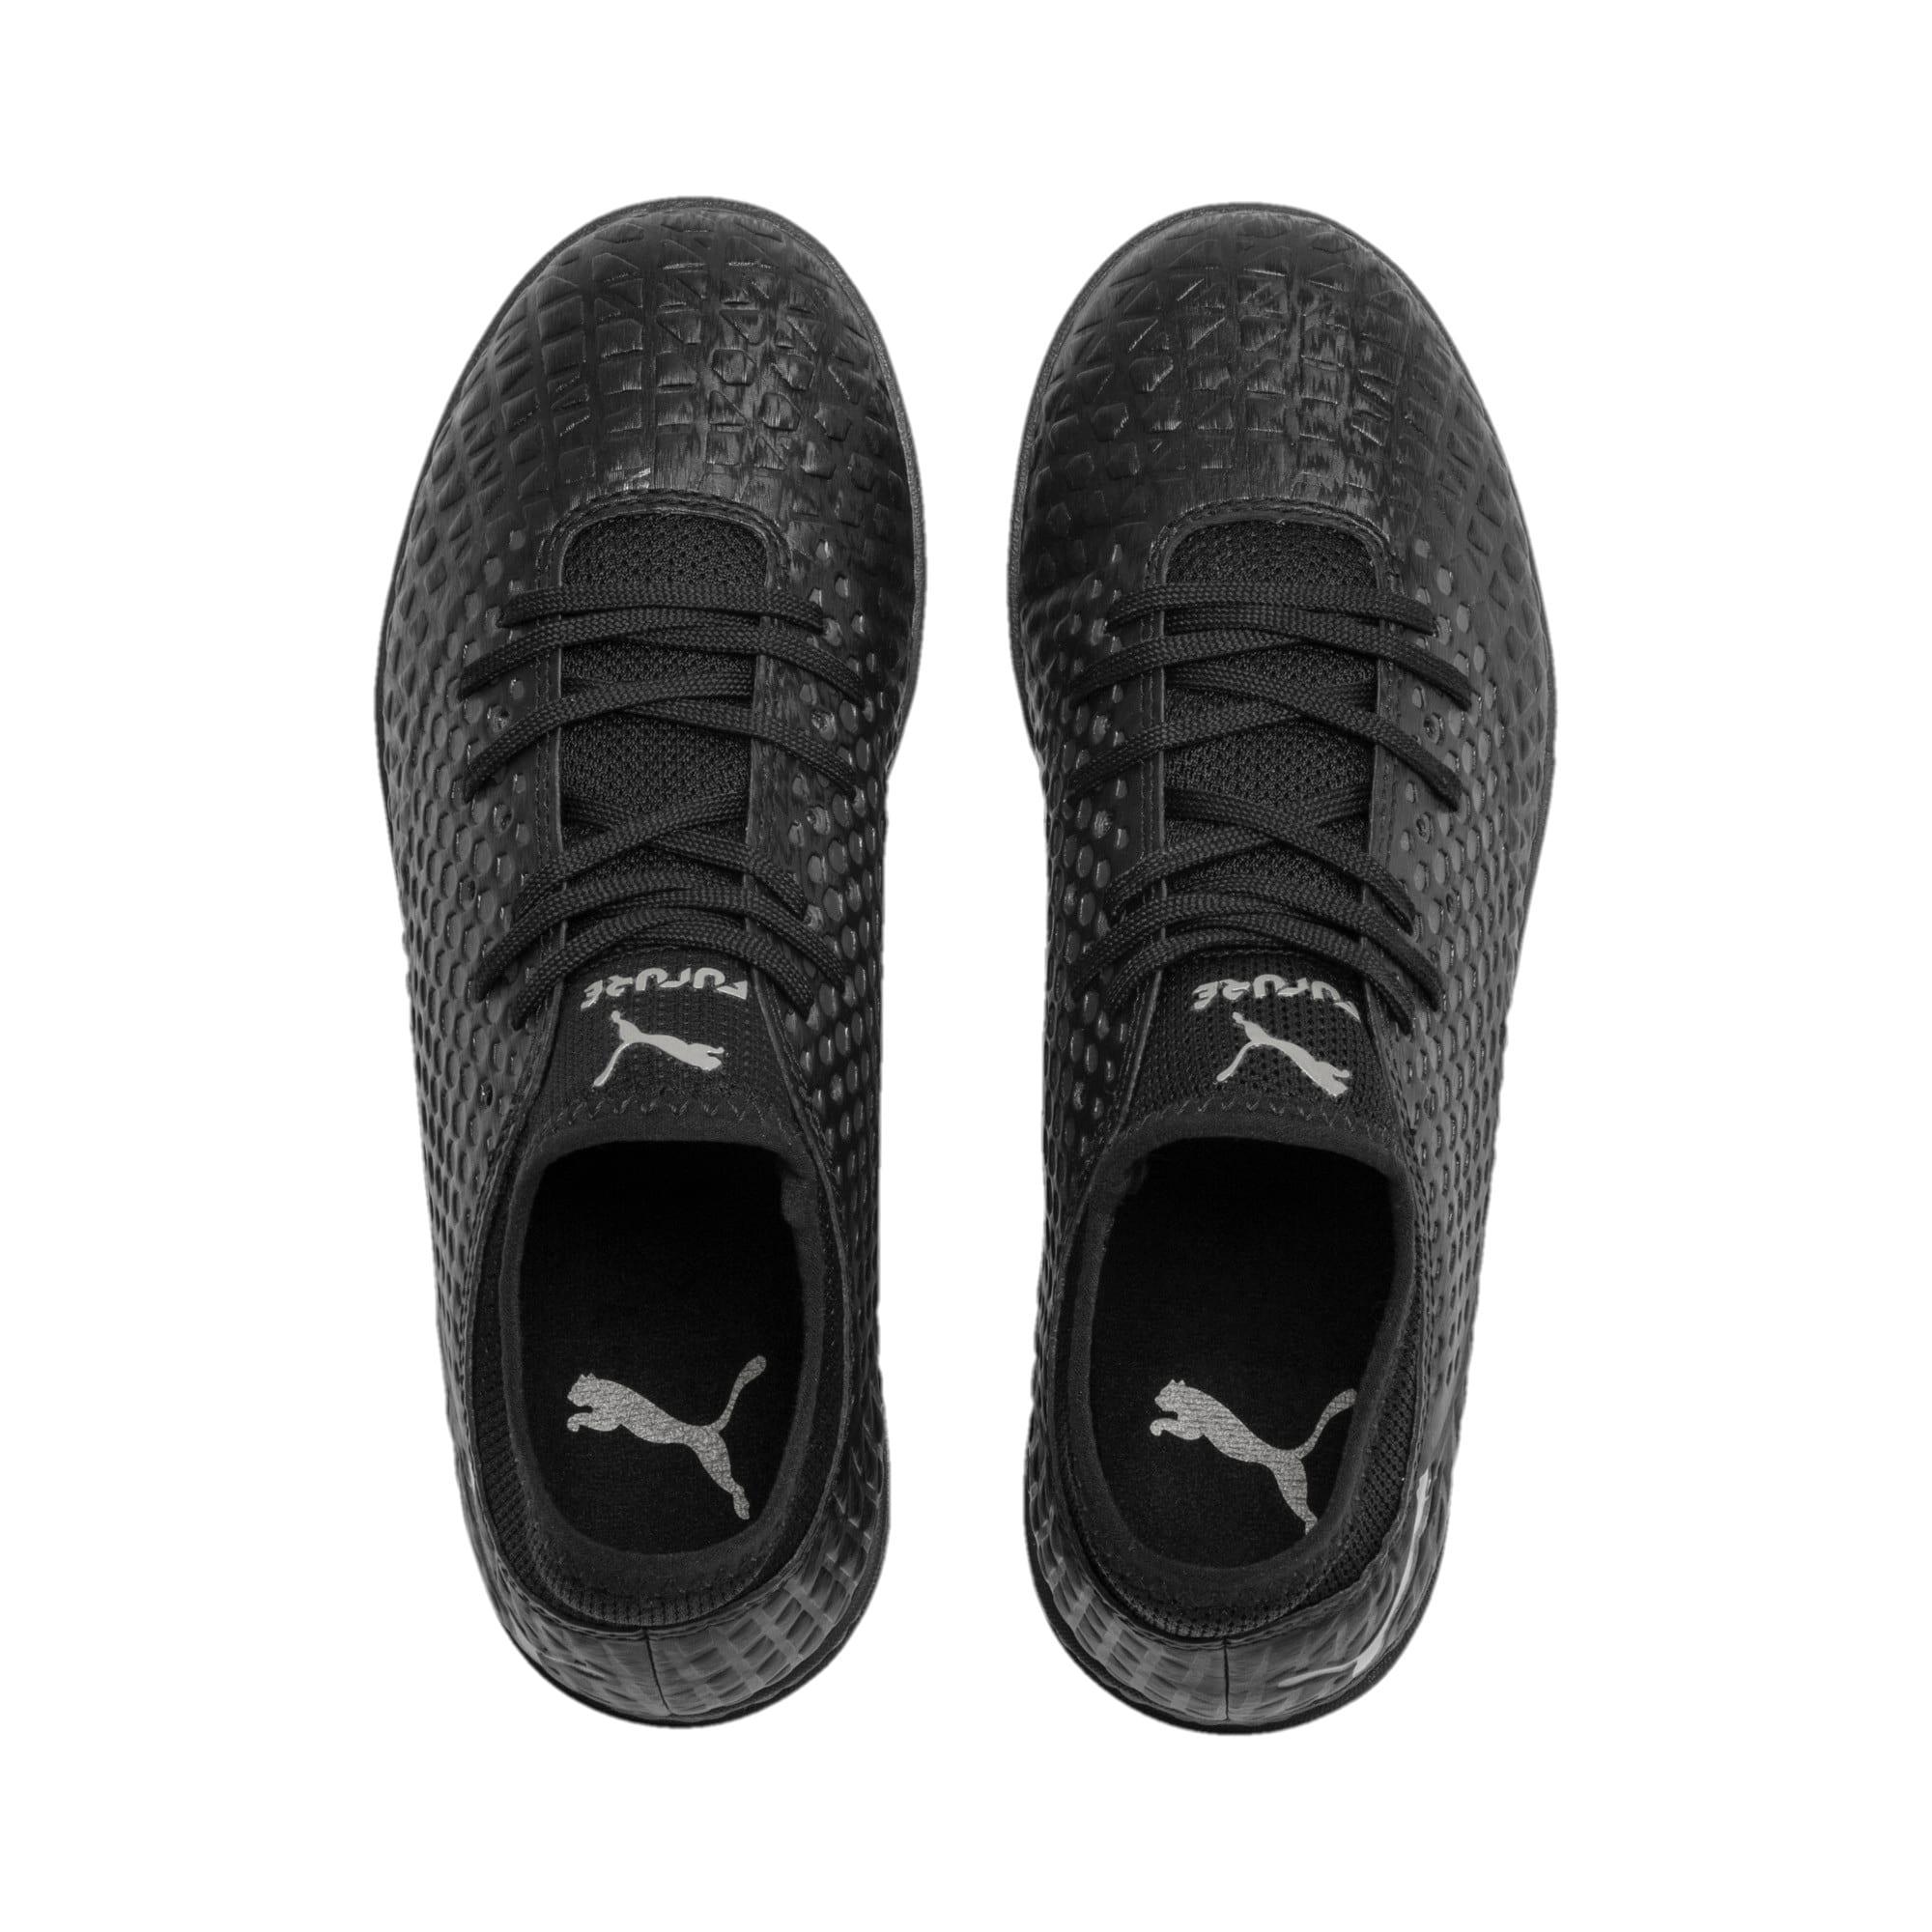 Thumbnail 6 of FUTURE 4.4 TT Youth Football Boots, Black-Black-Puma Aged Silver, medium